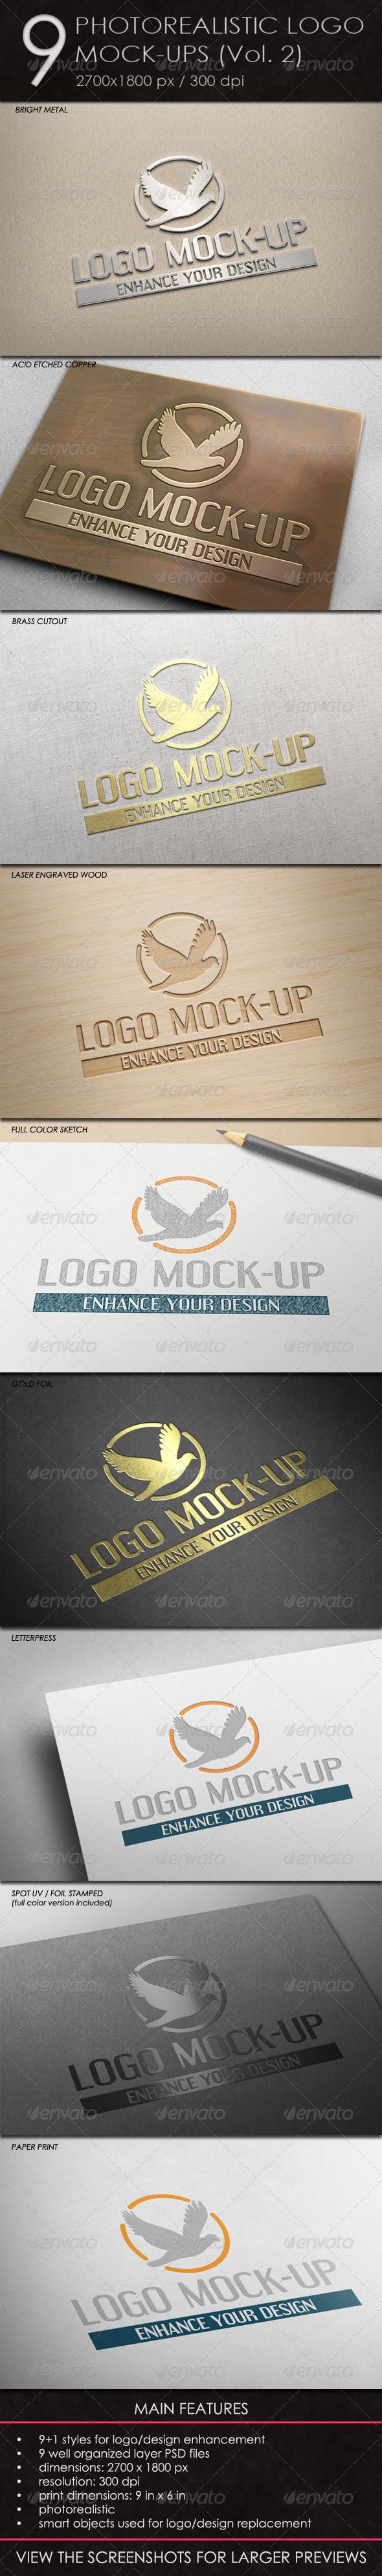 GraphicRiver 9 Photorealistic Logo Mock-Ups Vol.2 4870293